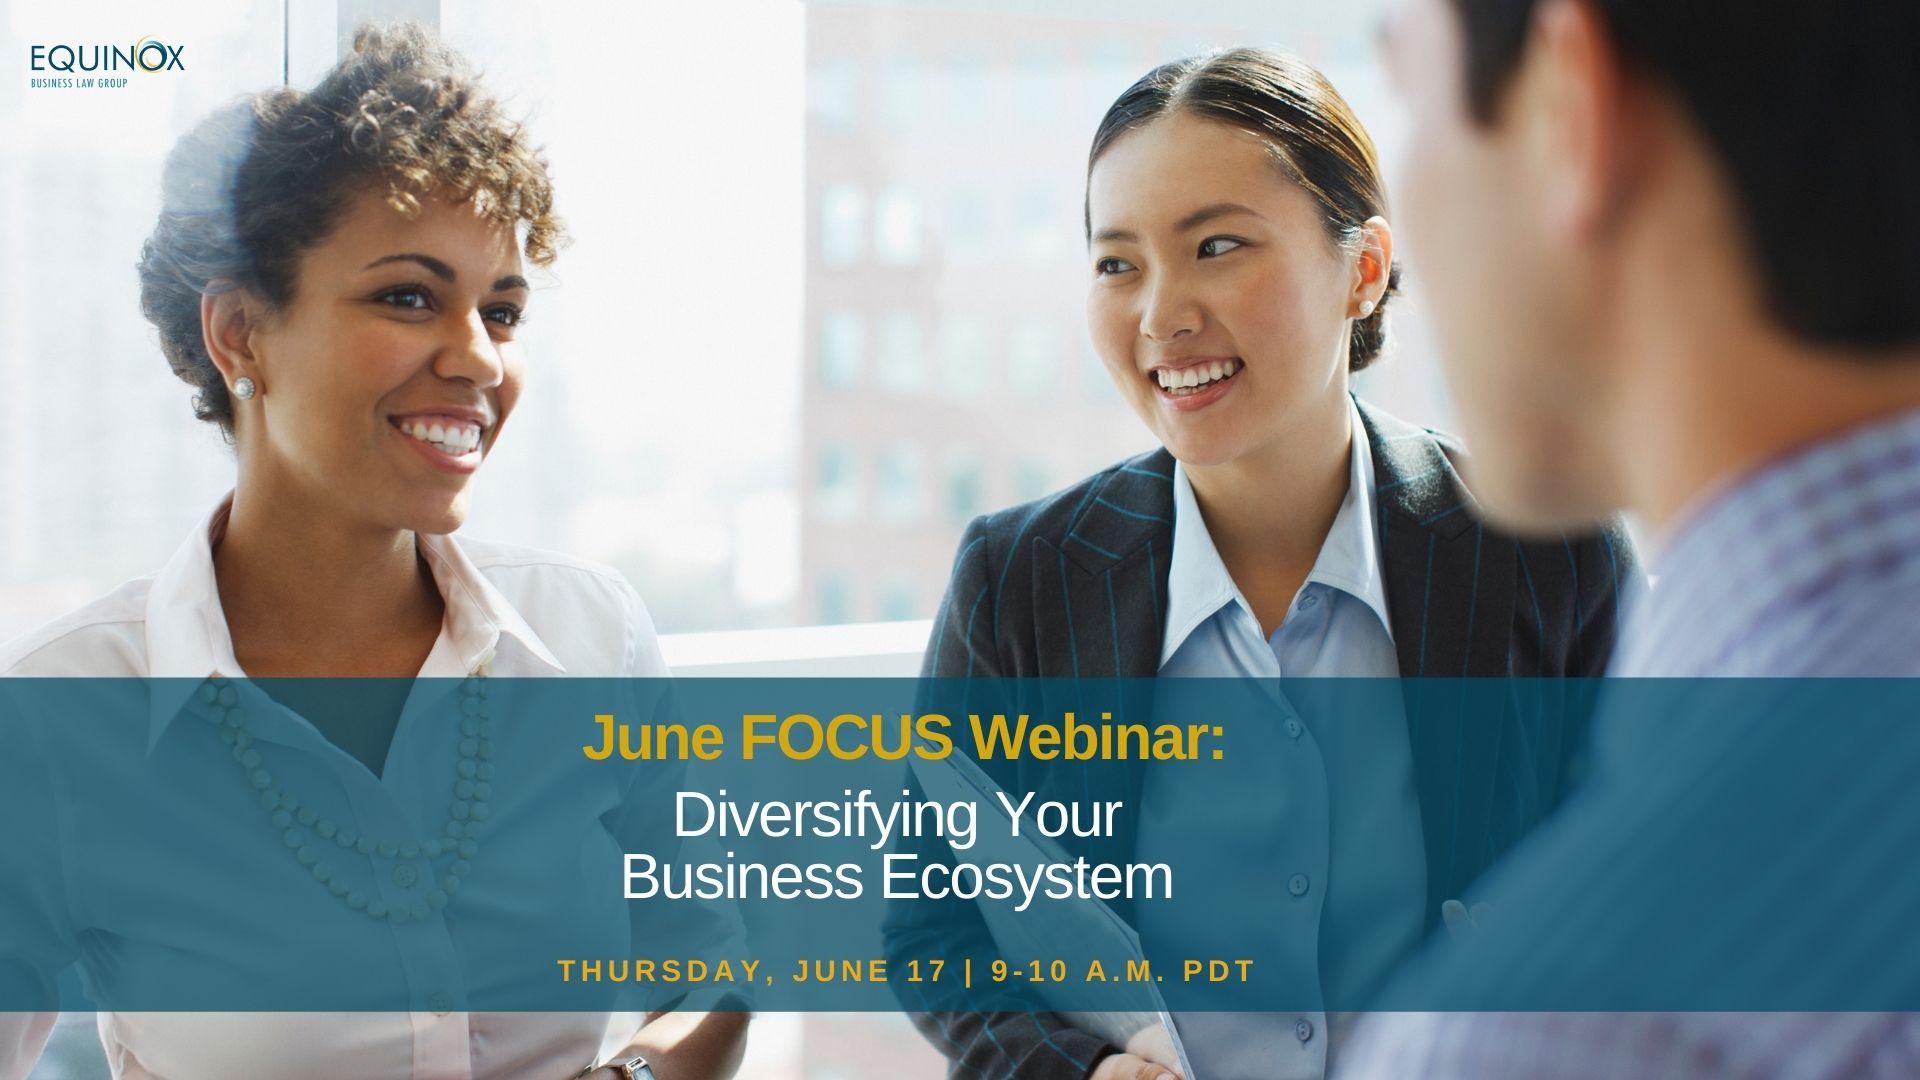 June FOCUS: Diversifying Your Business Ecosystem